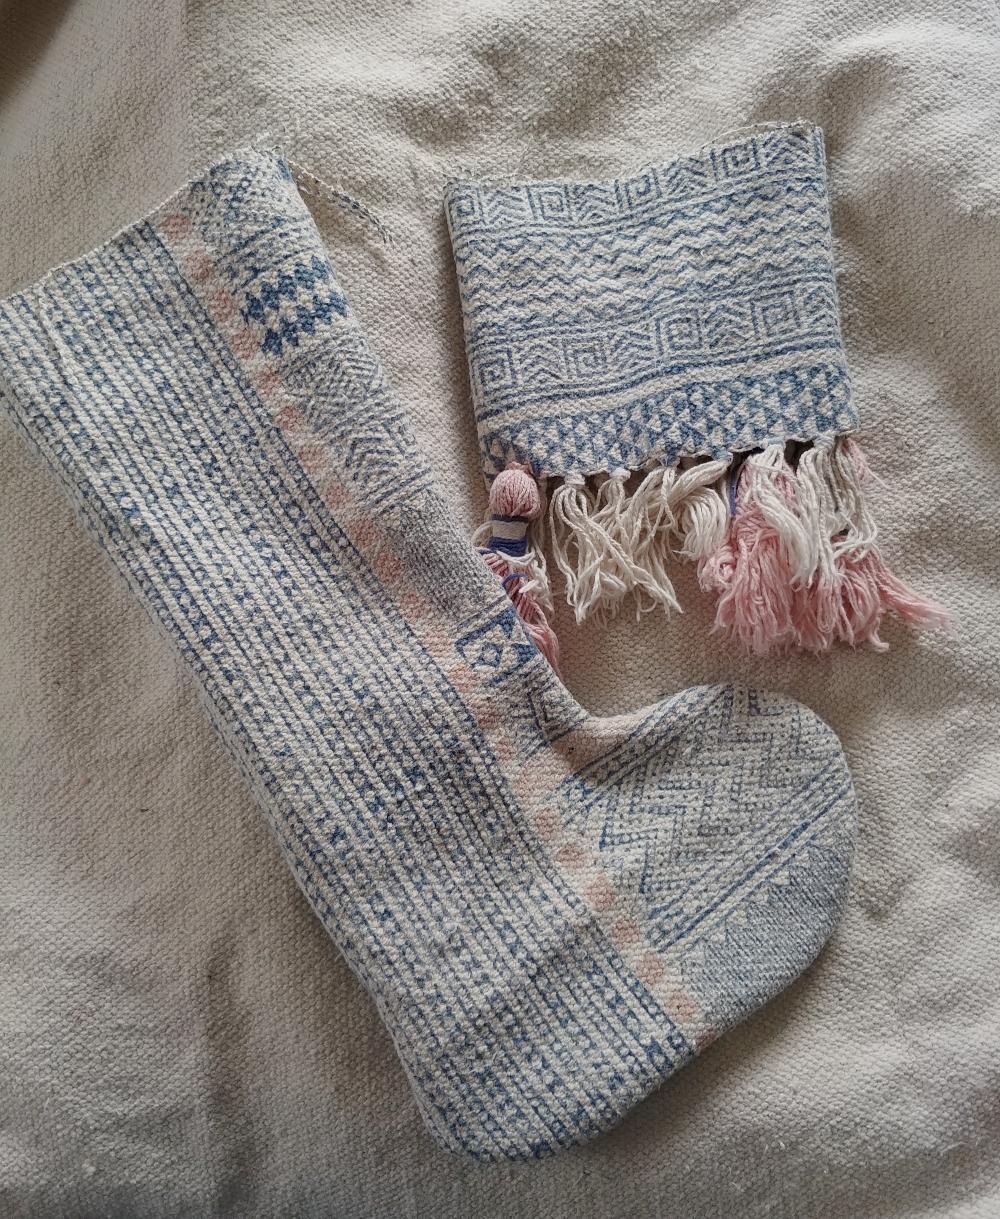 sew stocking parts